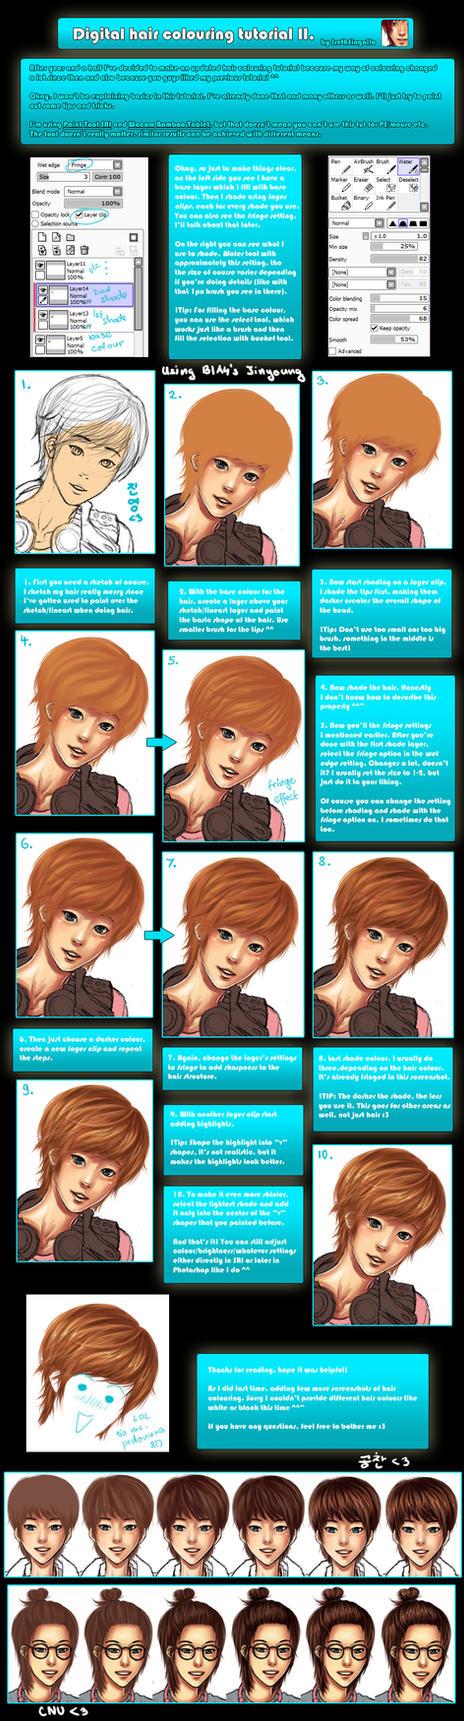 New Hair Colouring Tutorial by IrethSingollo